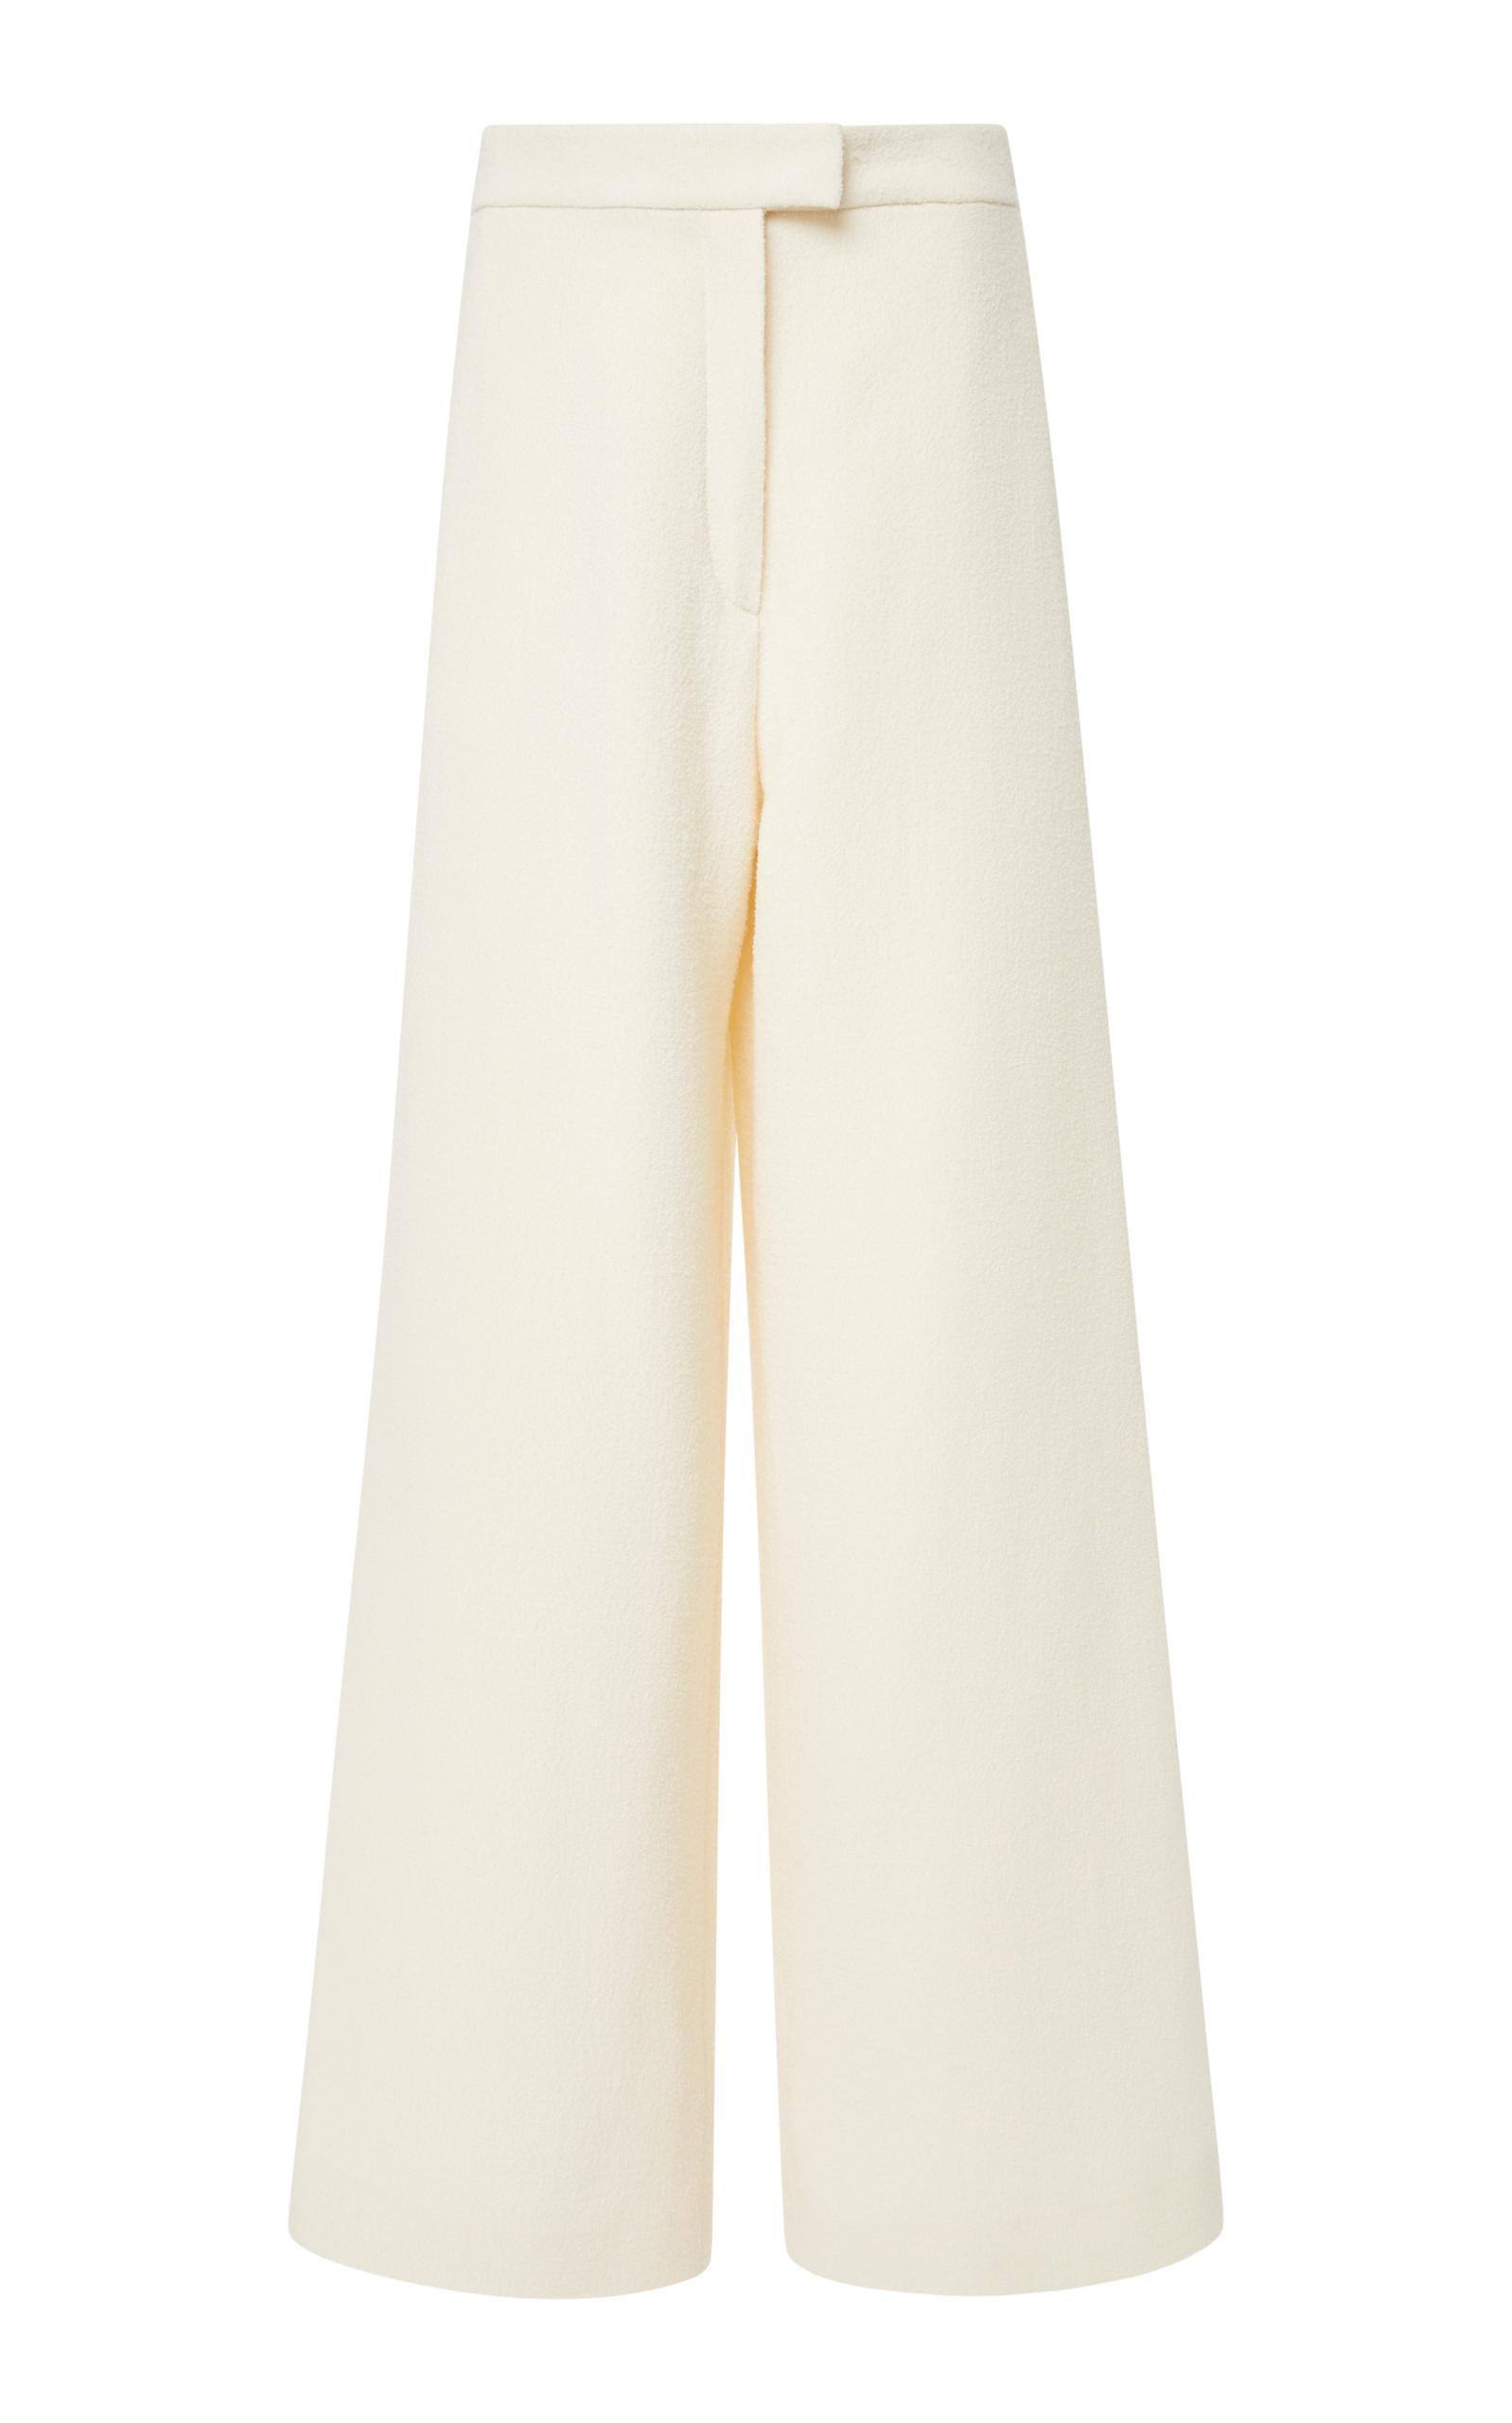 Tory Burch Thomas Full-Leg Double-Weave Pants In White